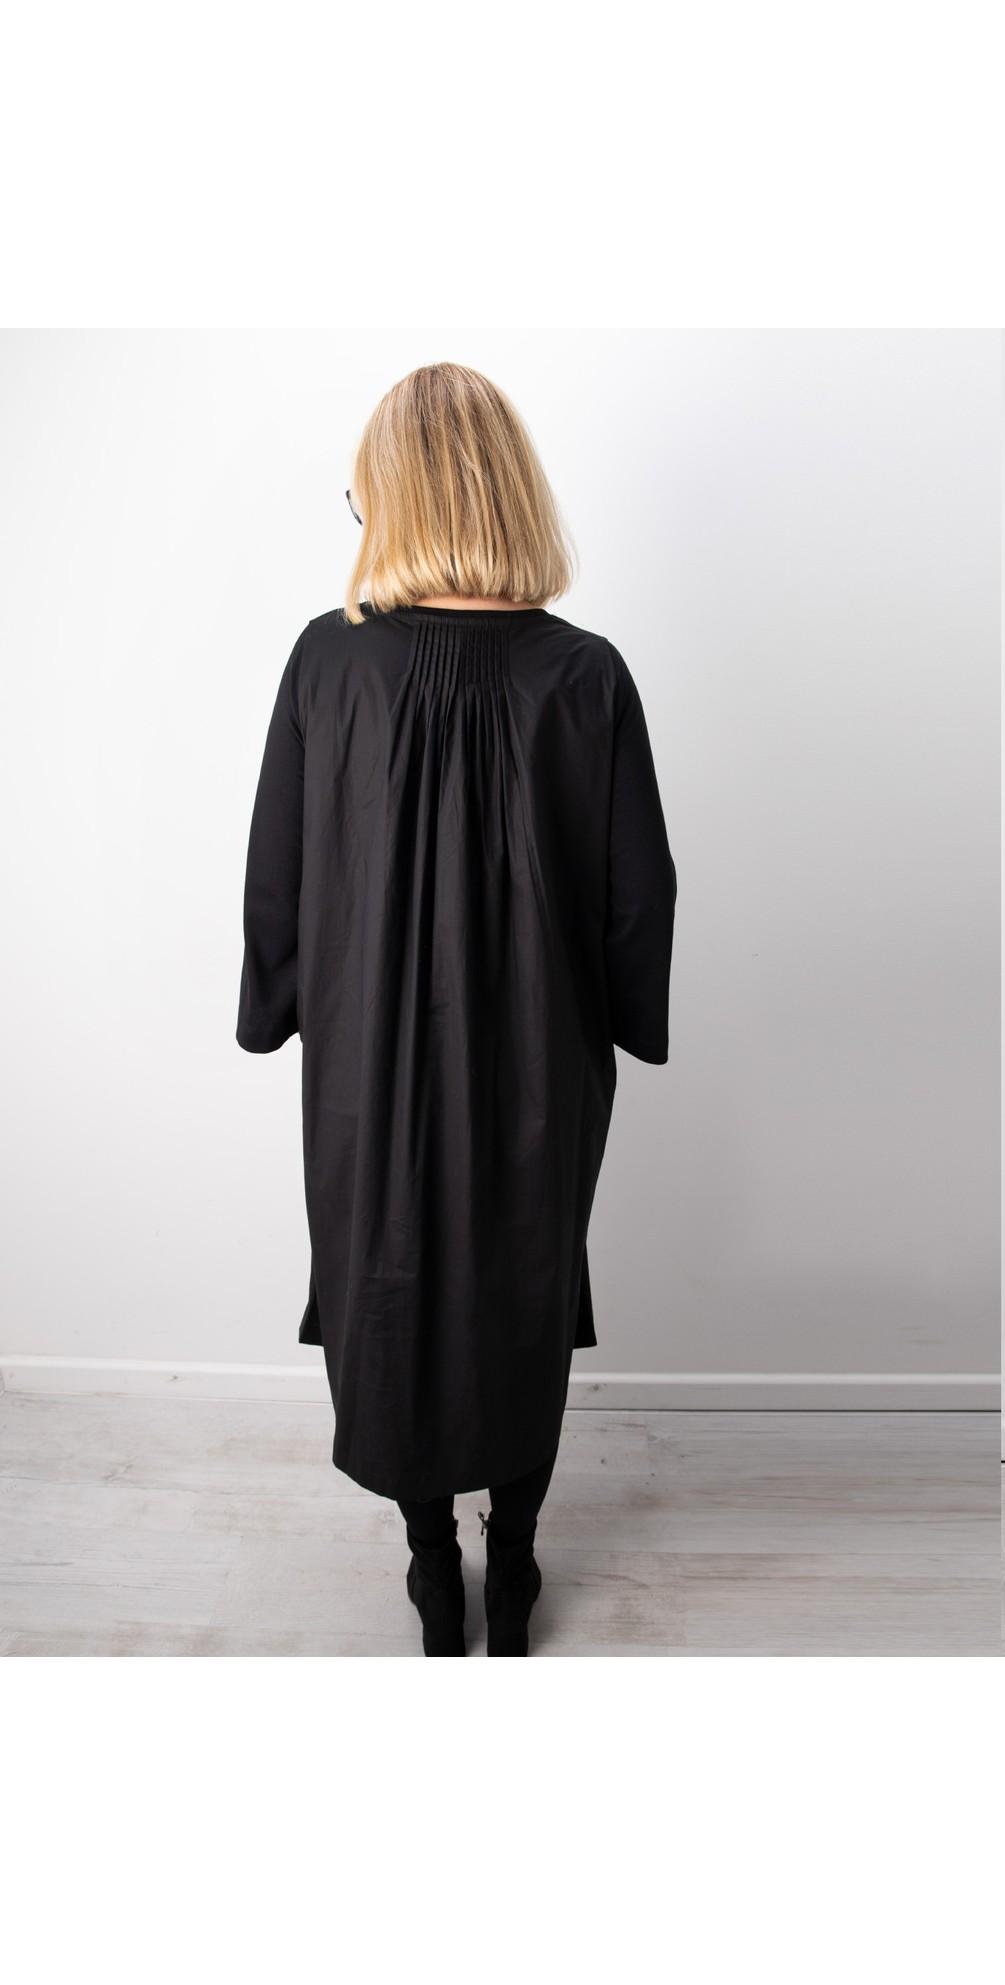 Nuelsa Dress main image